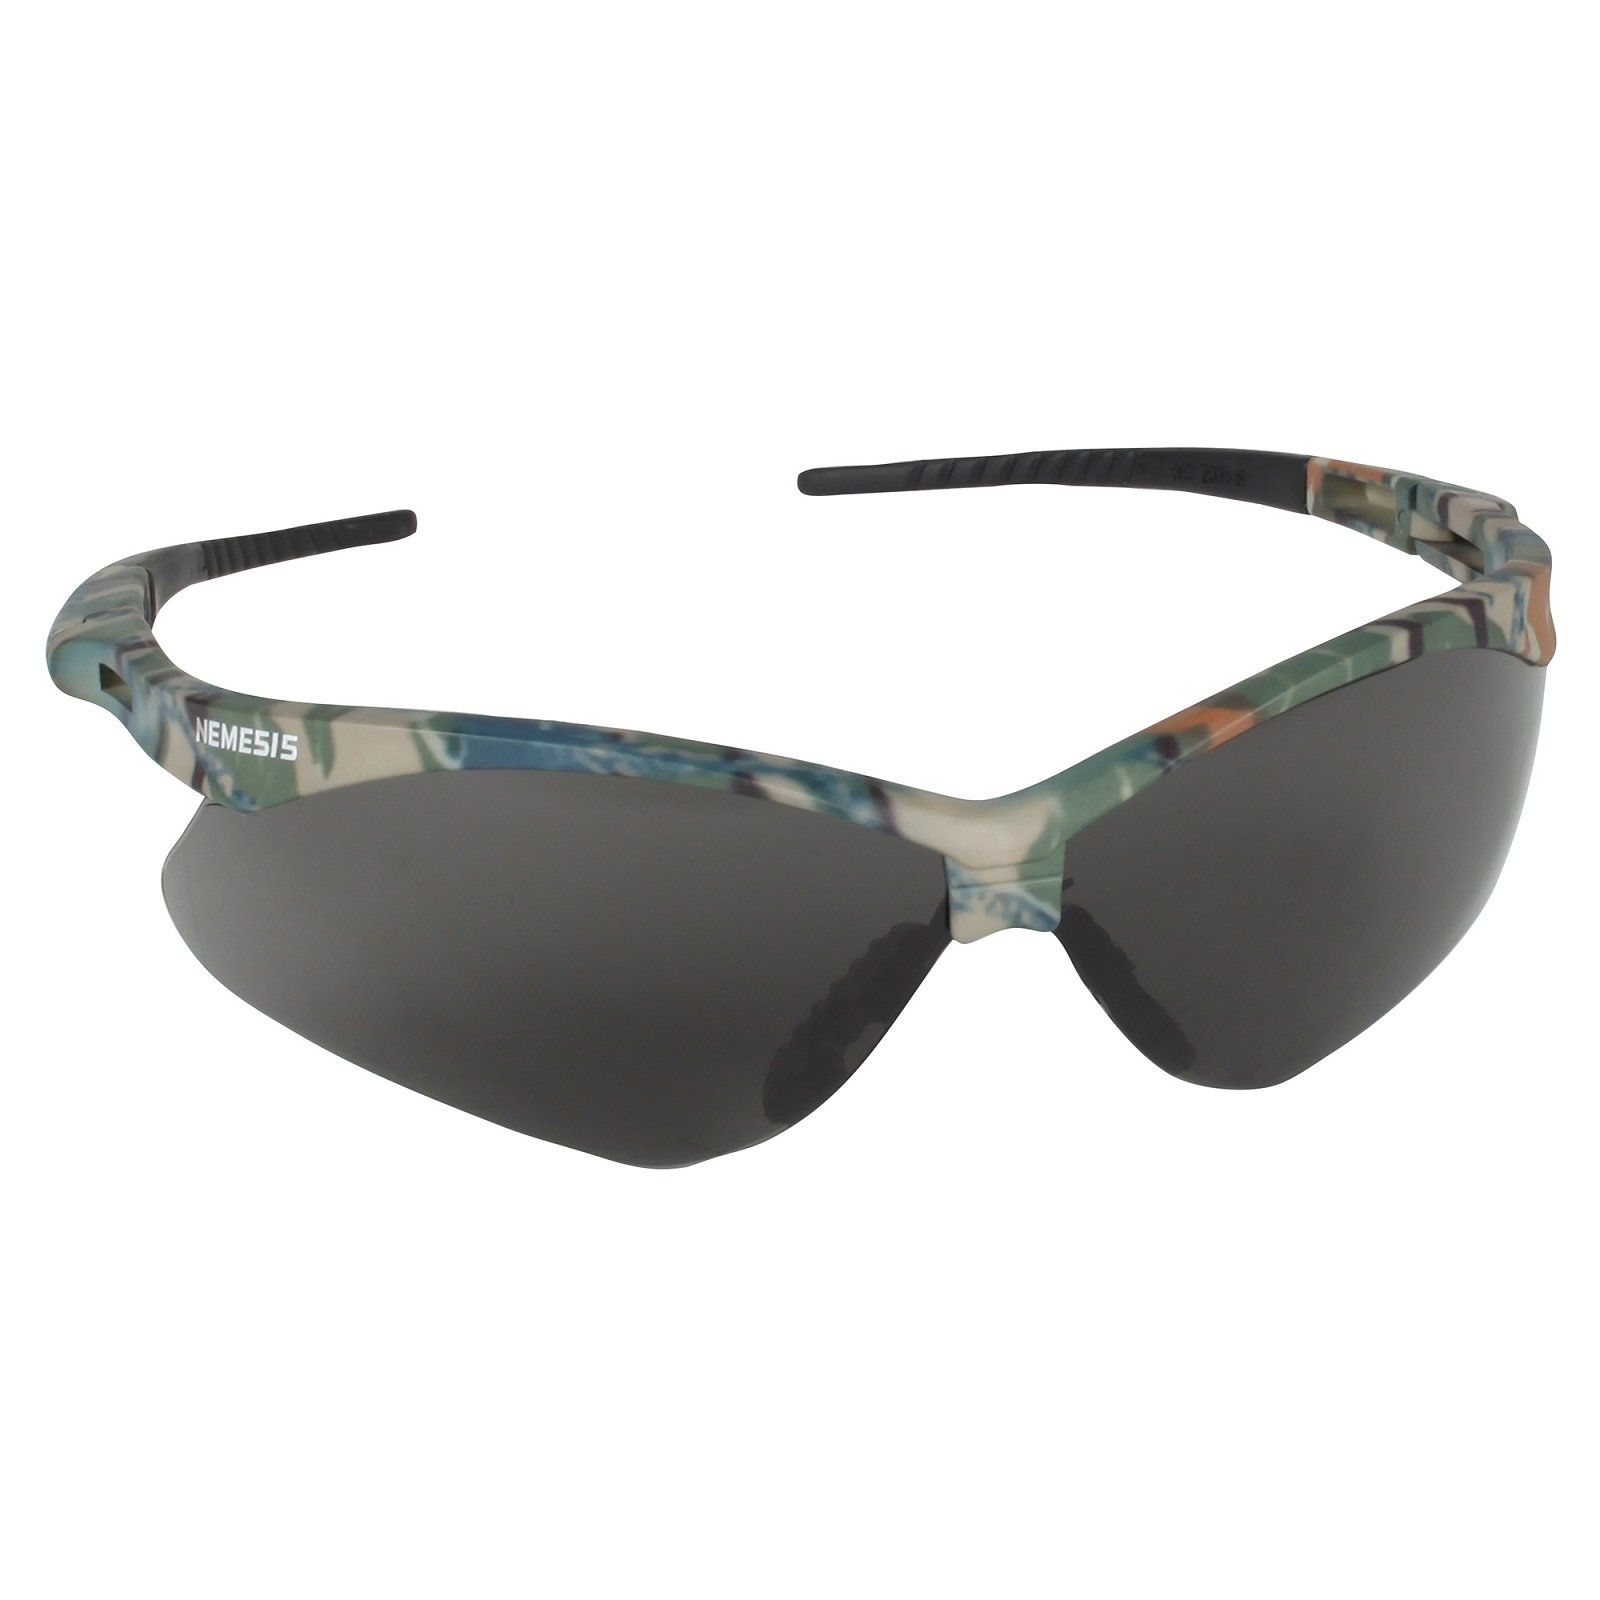 12 Pack Jackson Safety 3020707 V30 Nemesis Safety Glasses Camo Frame / Smoke Anti-Fog Lens(22609) by Allsafe Services & Materials (Image #2)